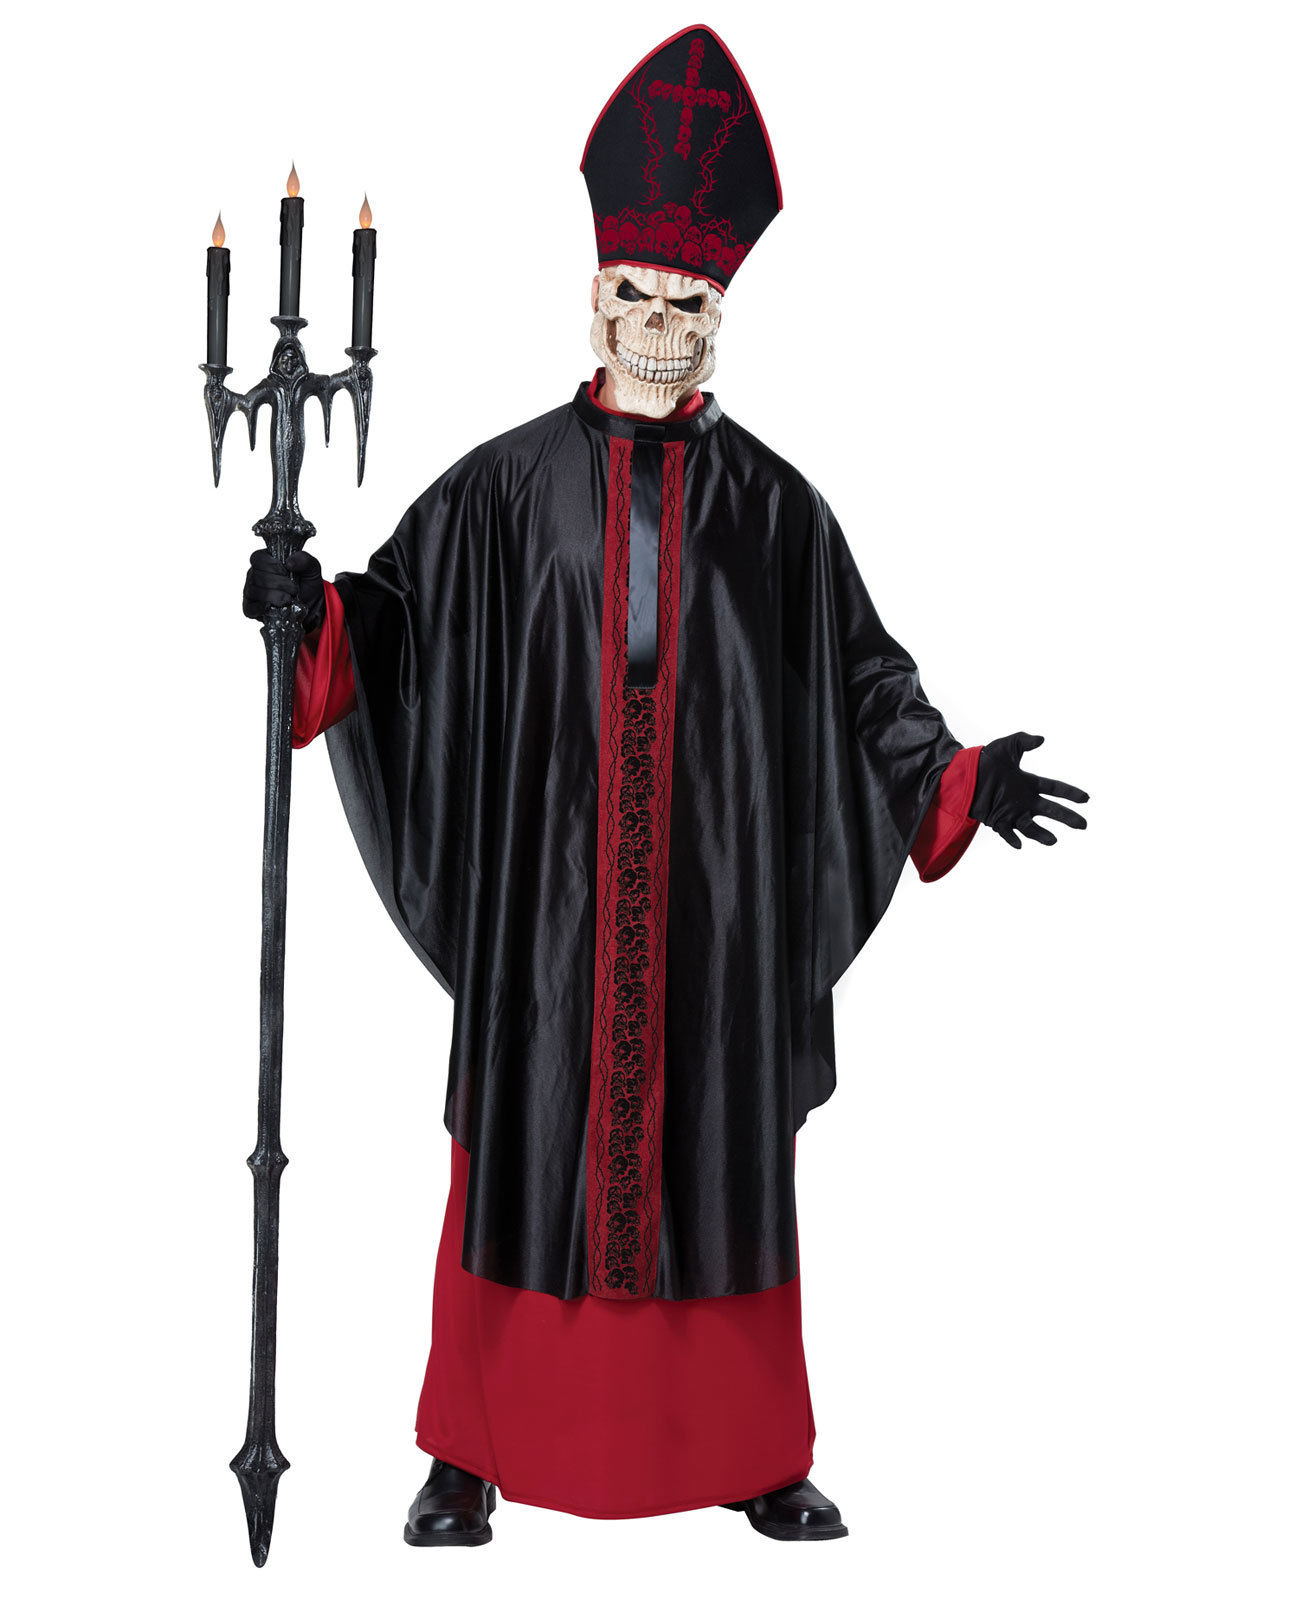 Black Mass Skeleton Priest Grim Reaper Evil Pope Gothic Adult Costume S//M L//XL